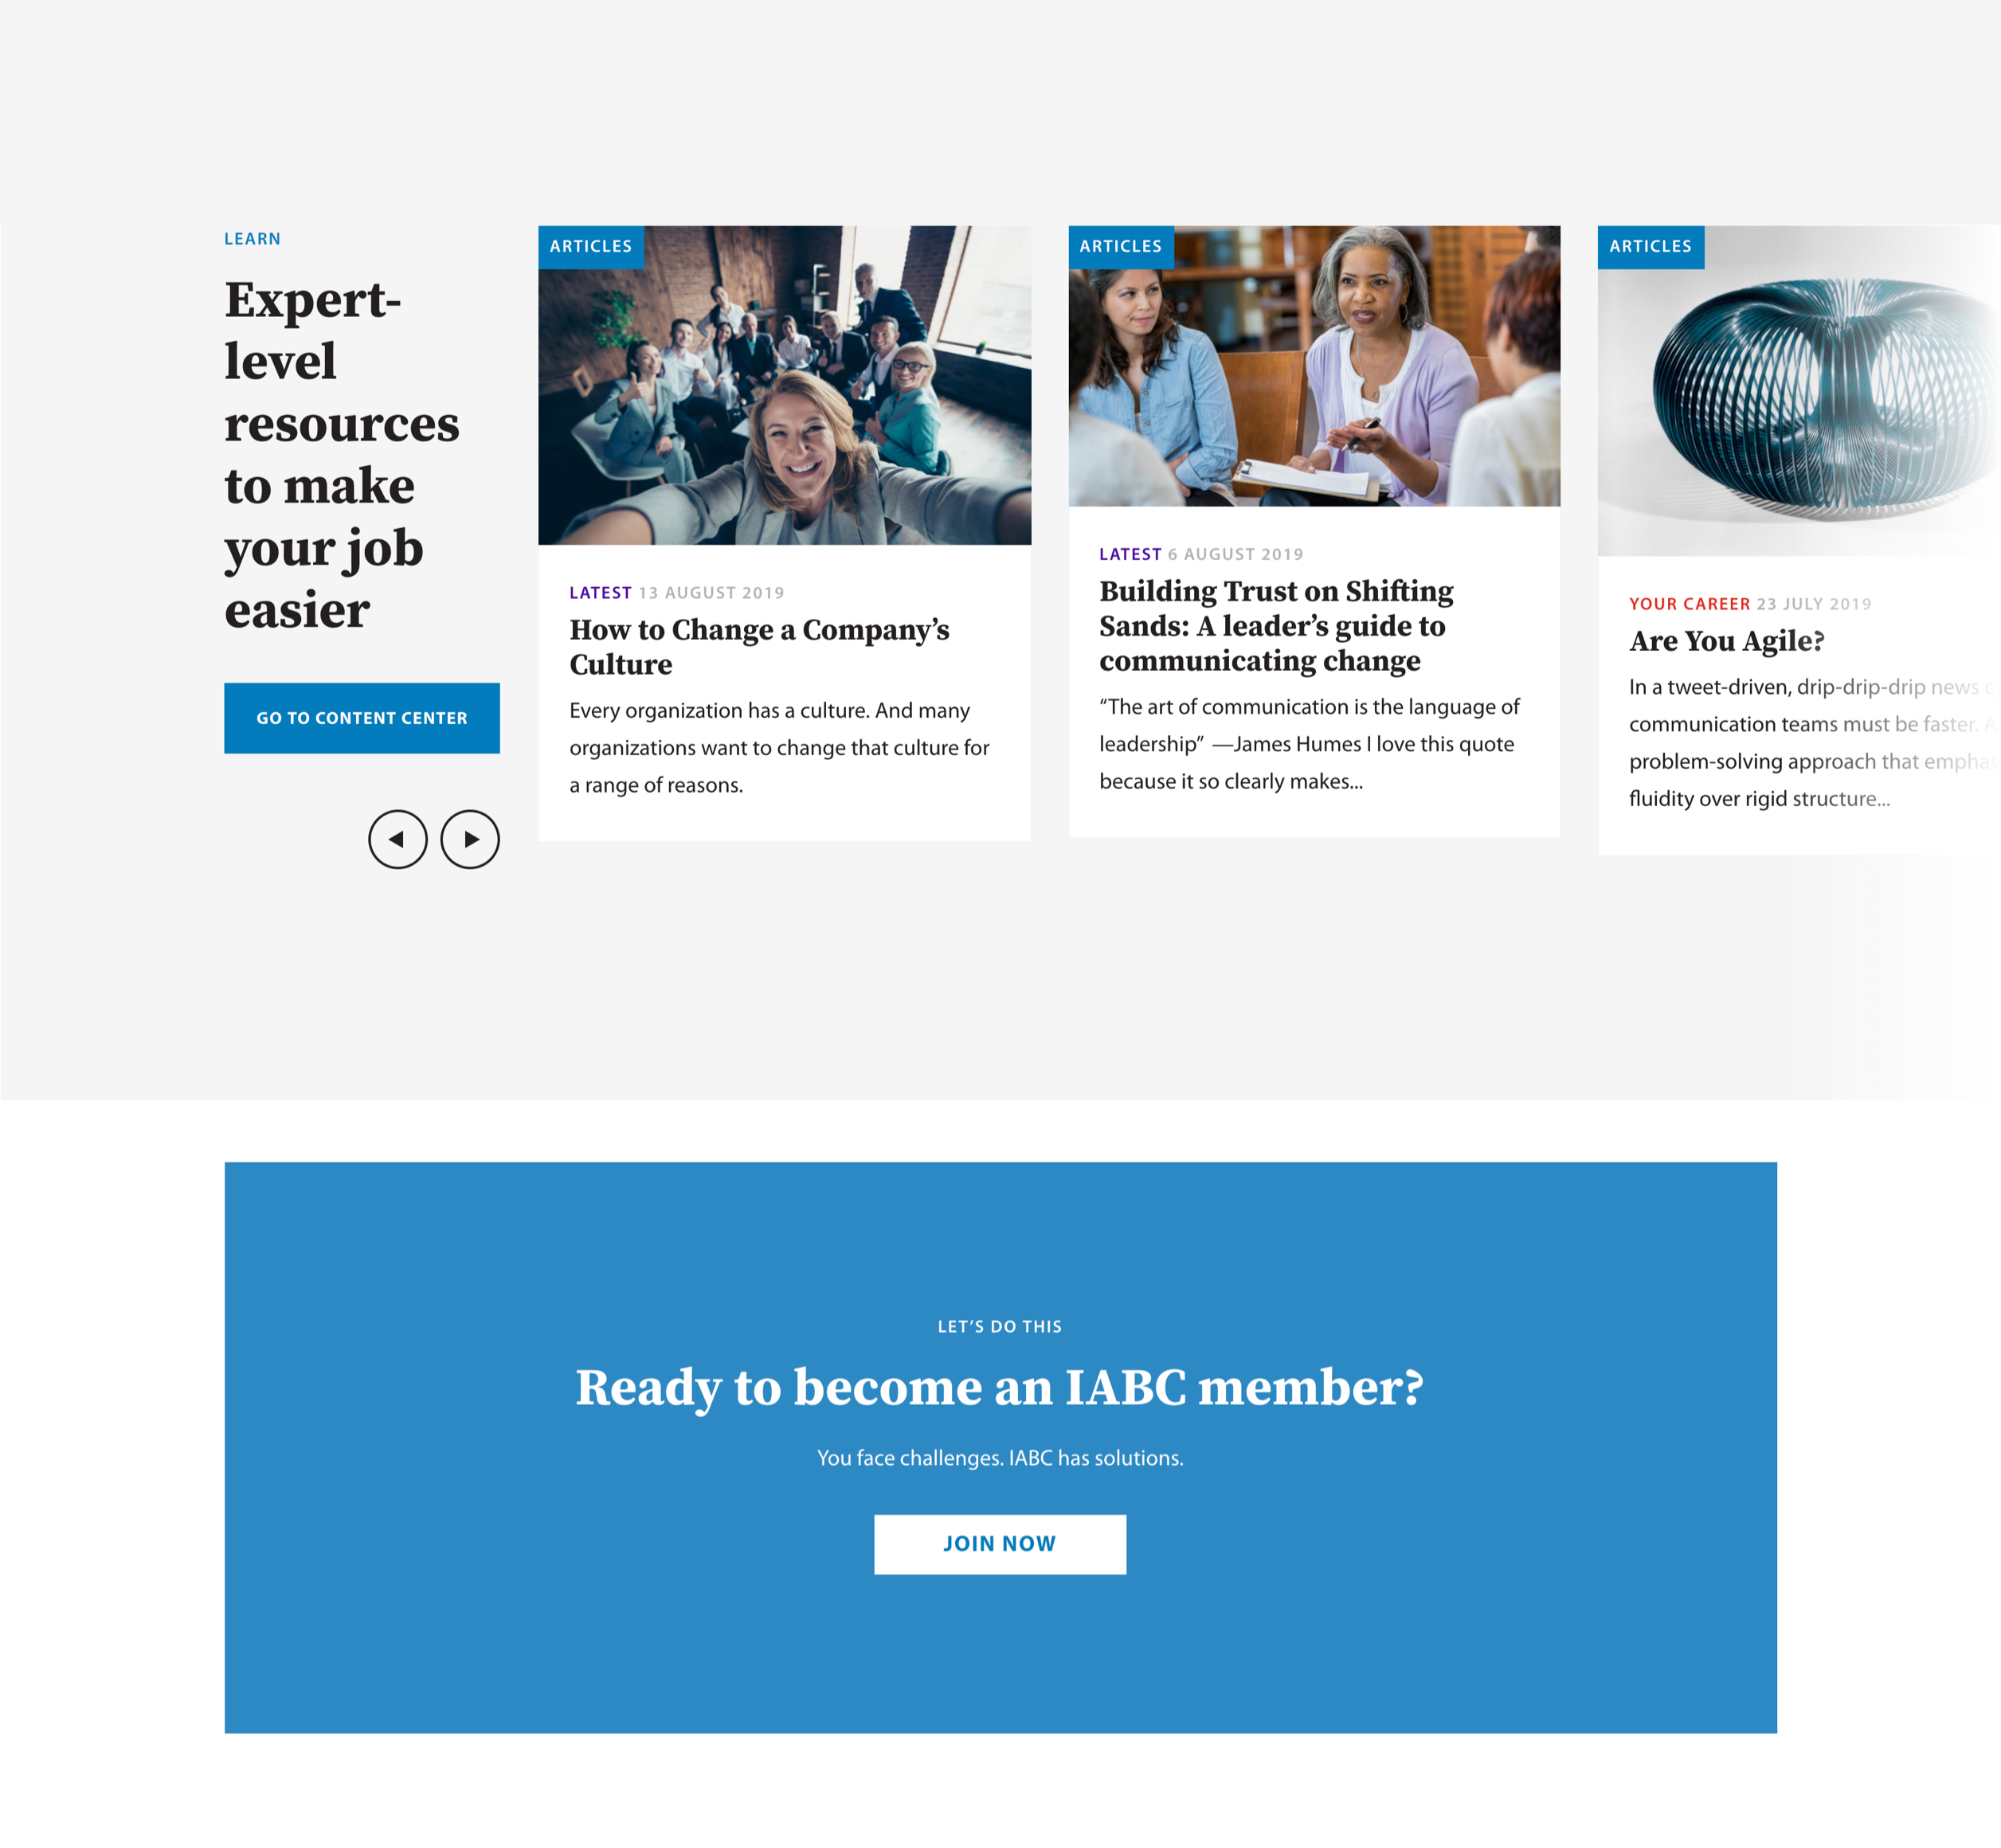 IABC - Gallery - Learn